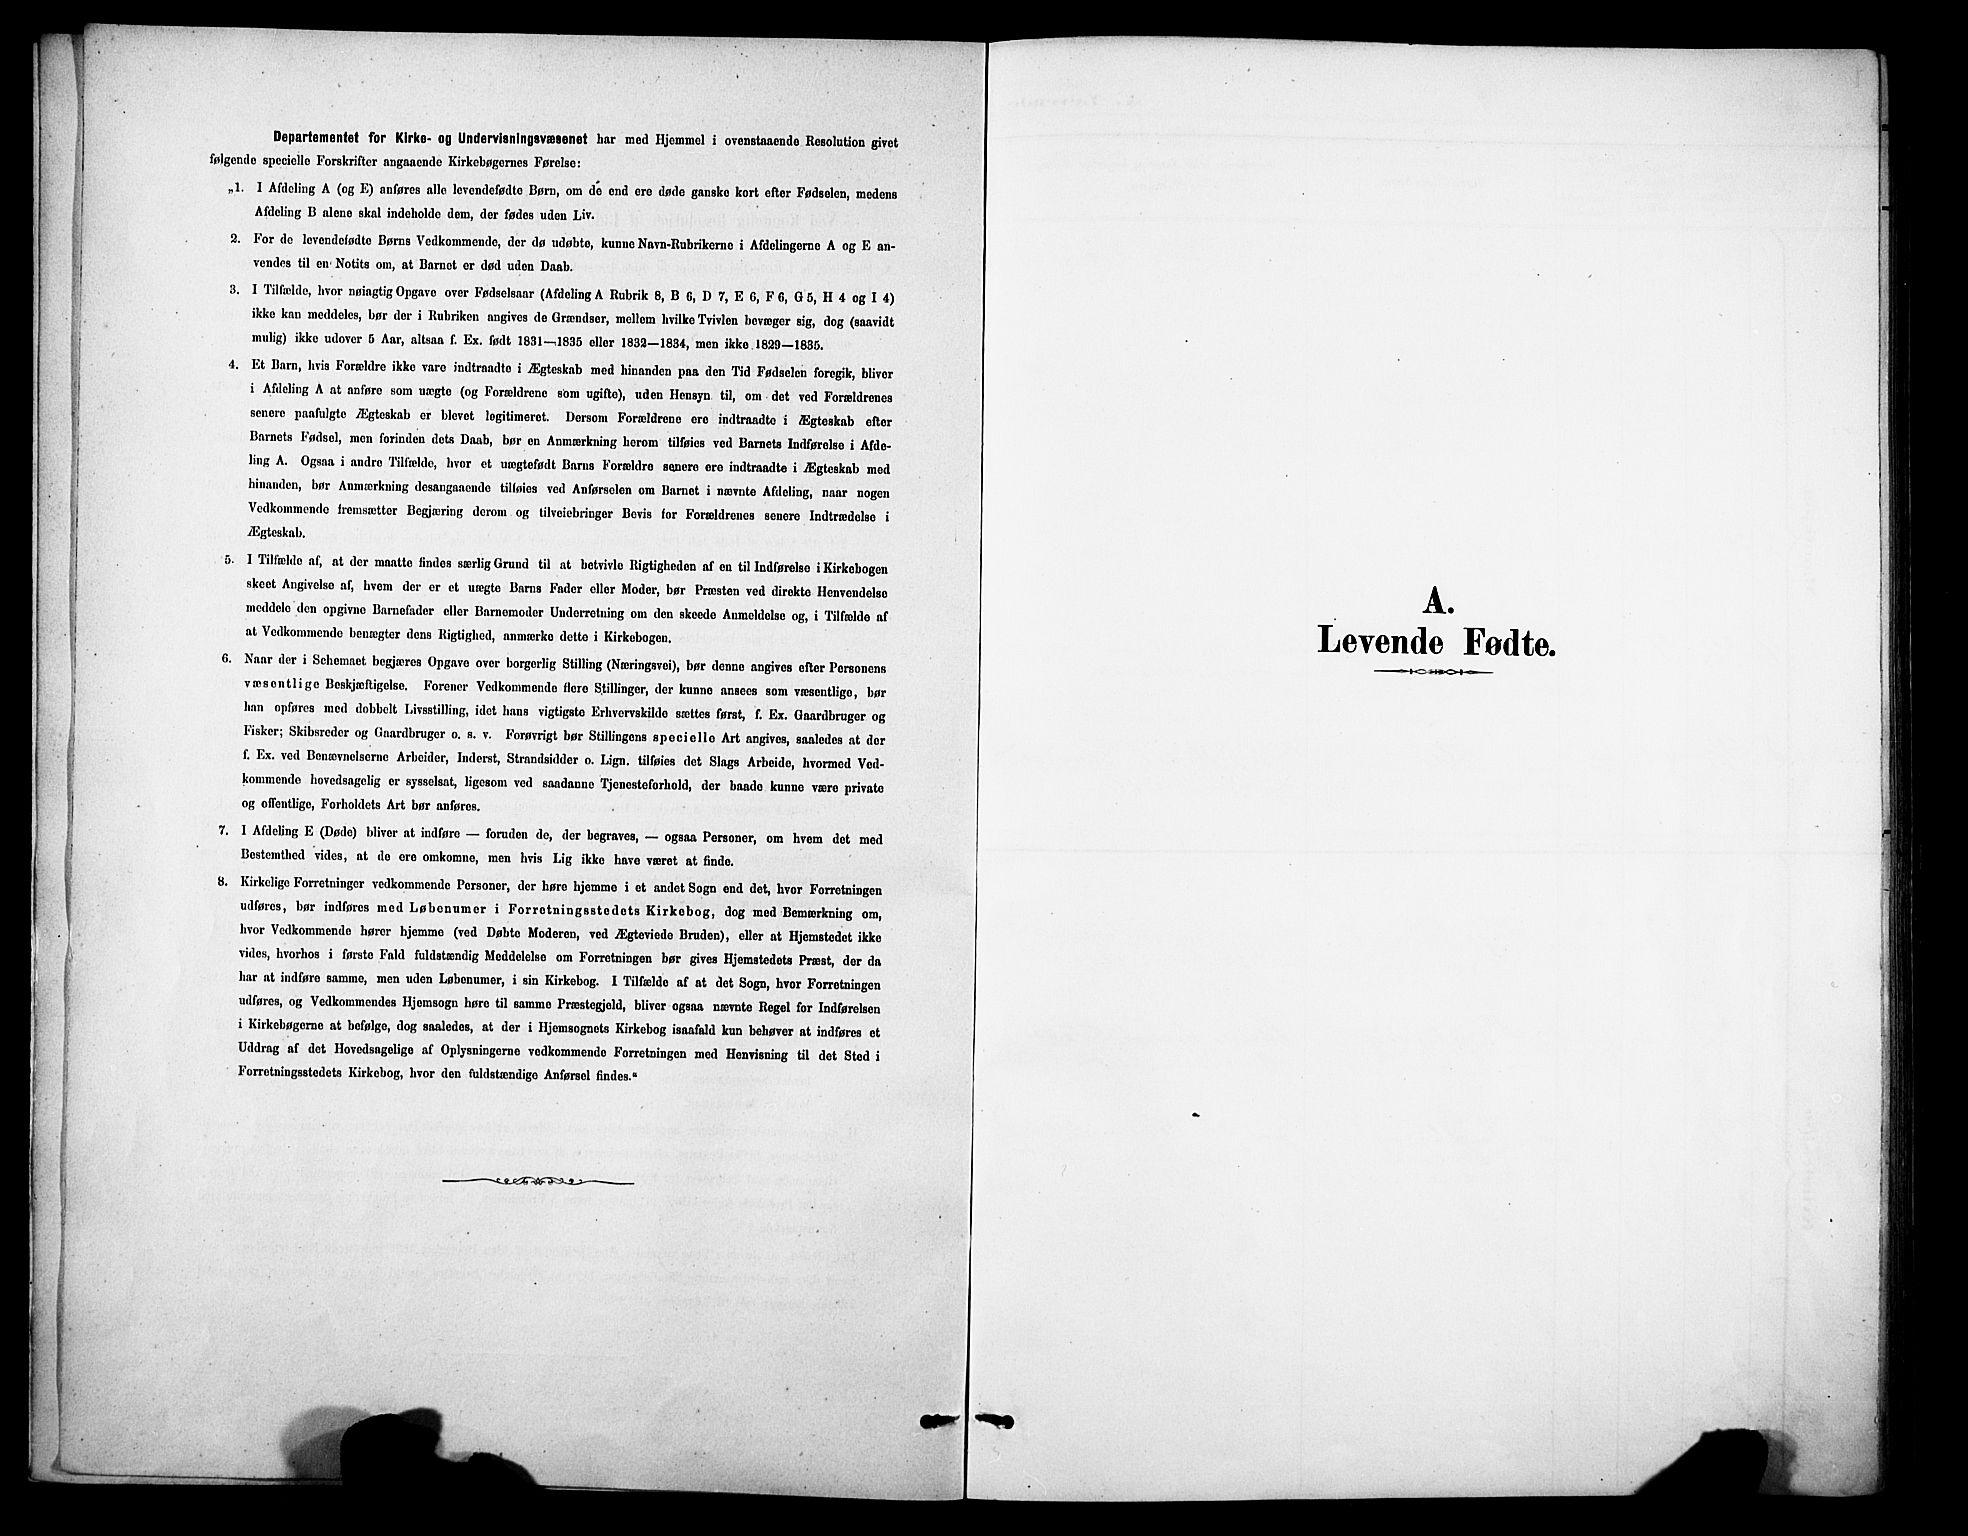 SAH, Sør-Aurdal prestekontor, Ministerialbok nr. 10, 1886-1906